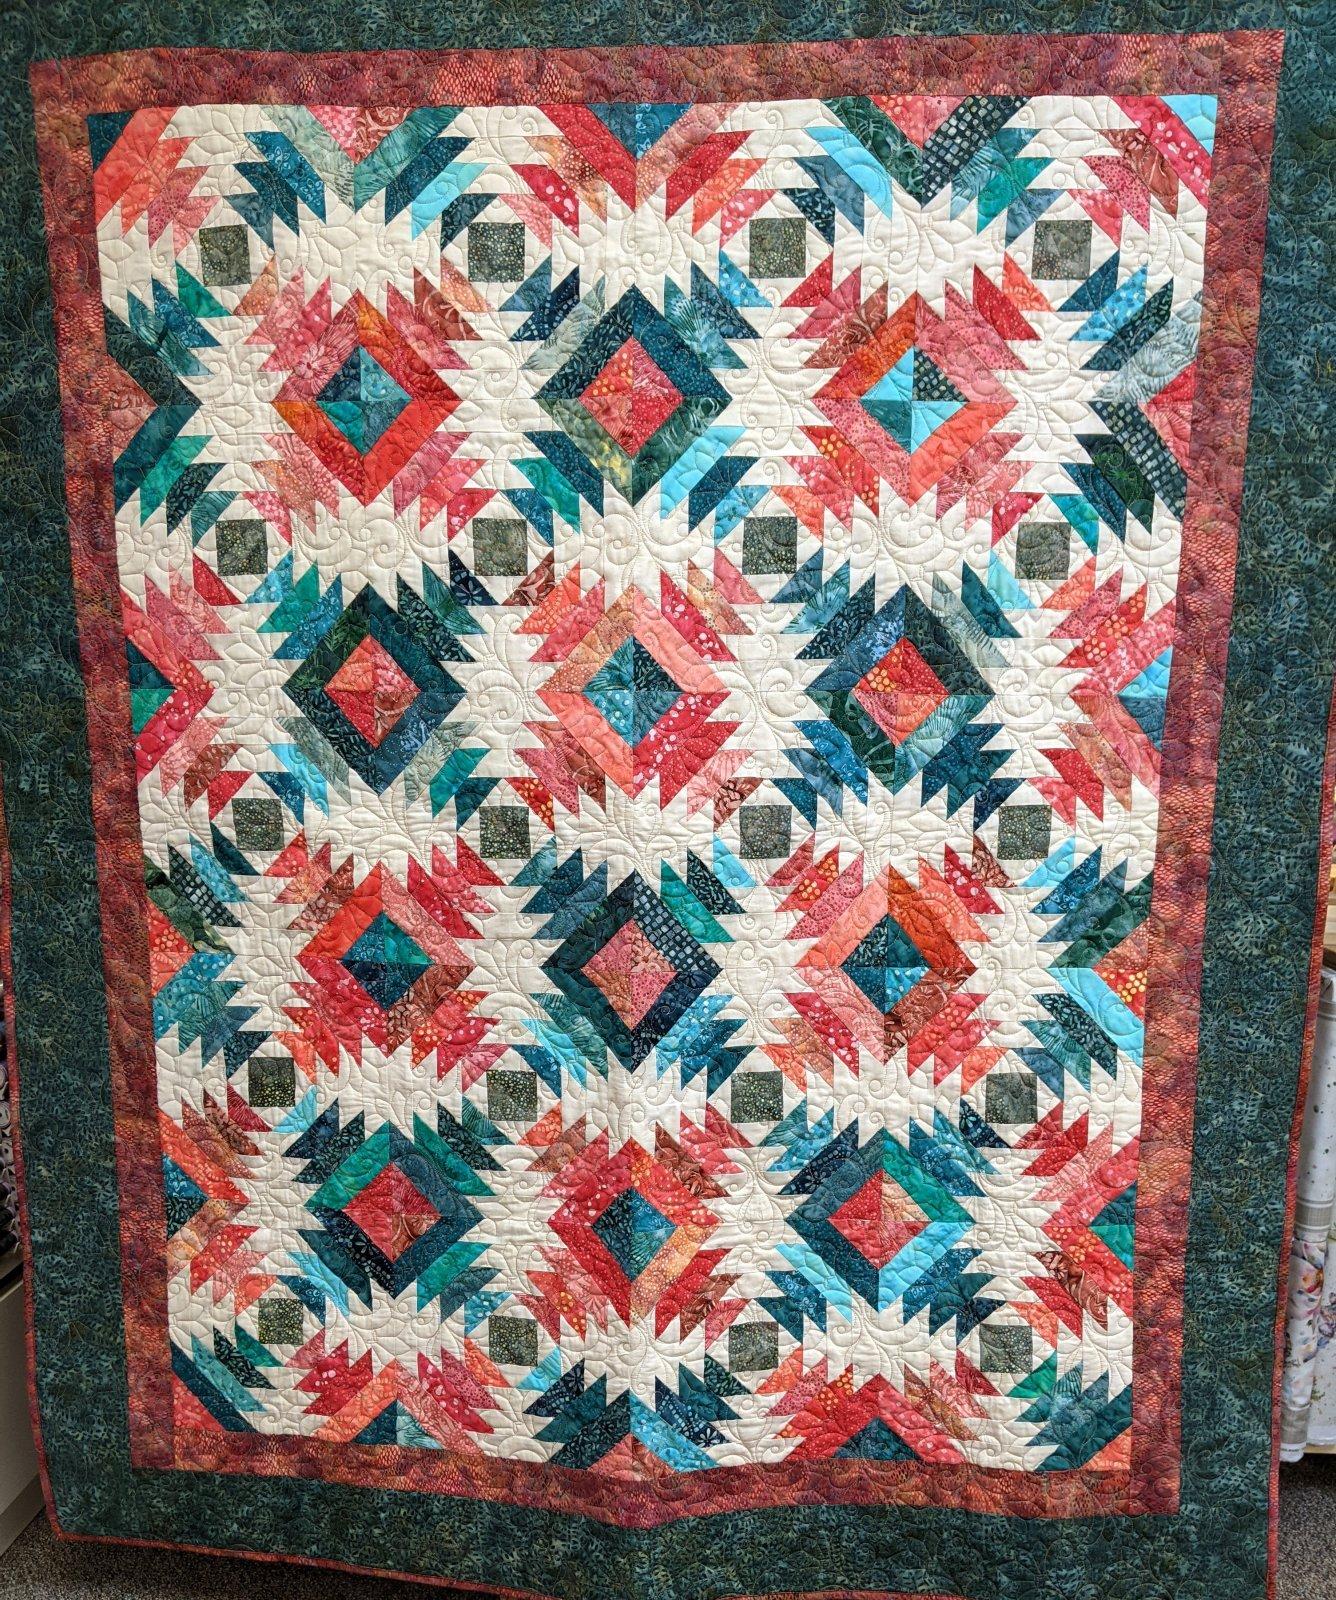 Pineapple Punch Quilt Kit 52 x 62